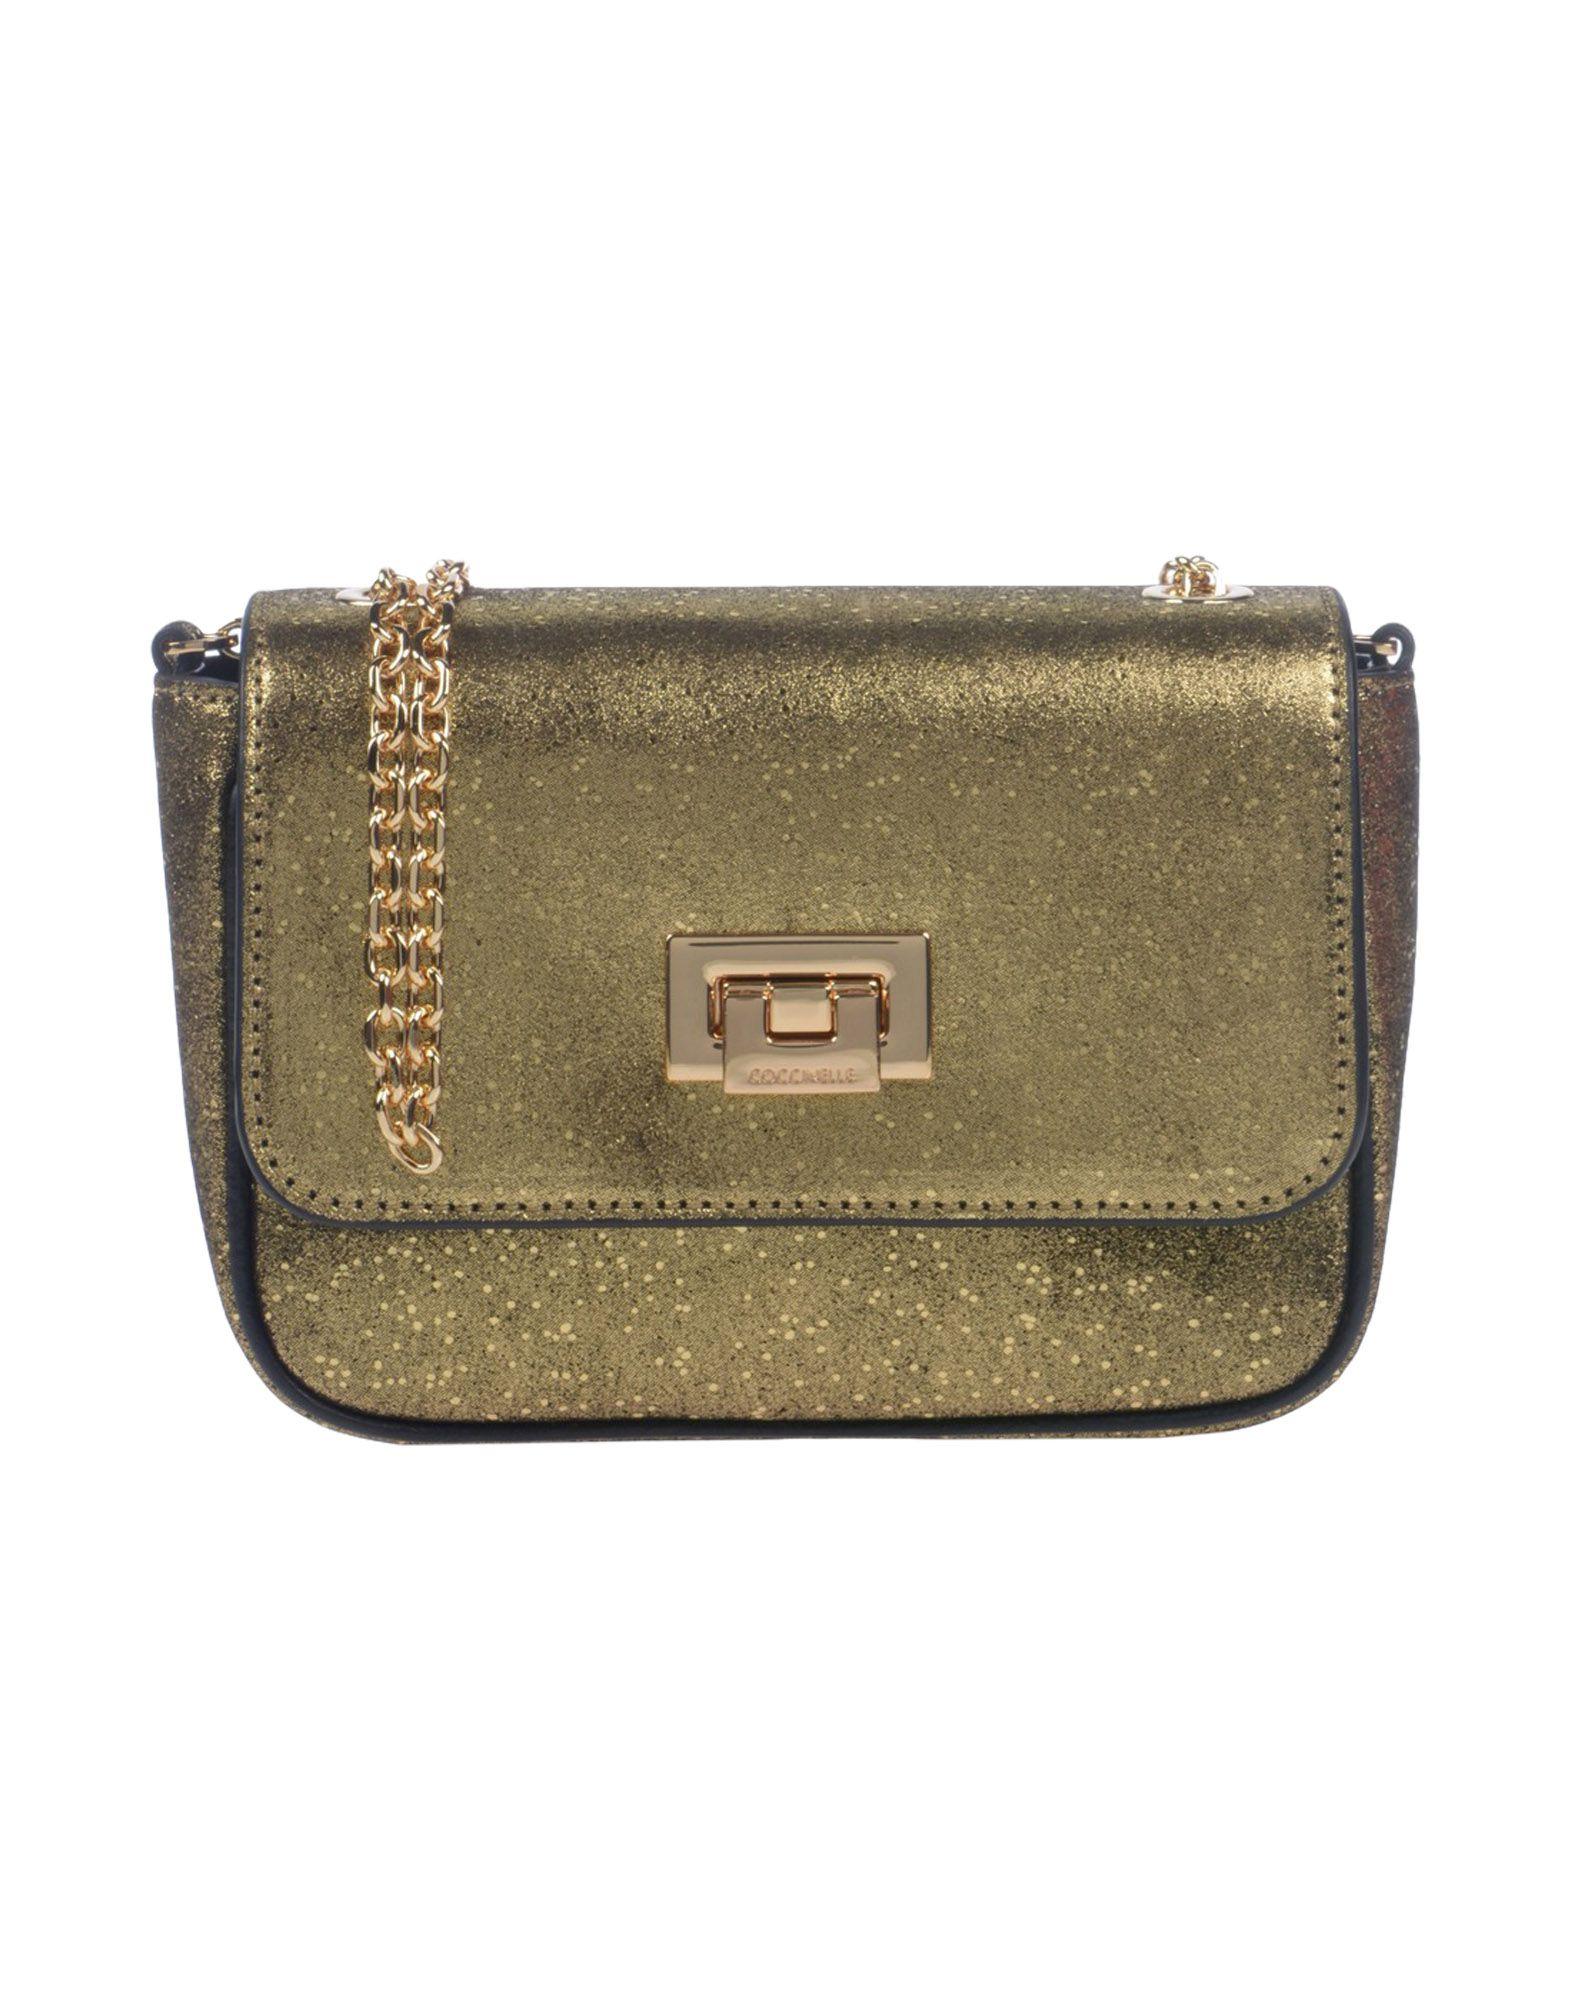 COCCINELLE Сумка через плечо сумка coccinelle сумка